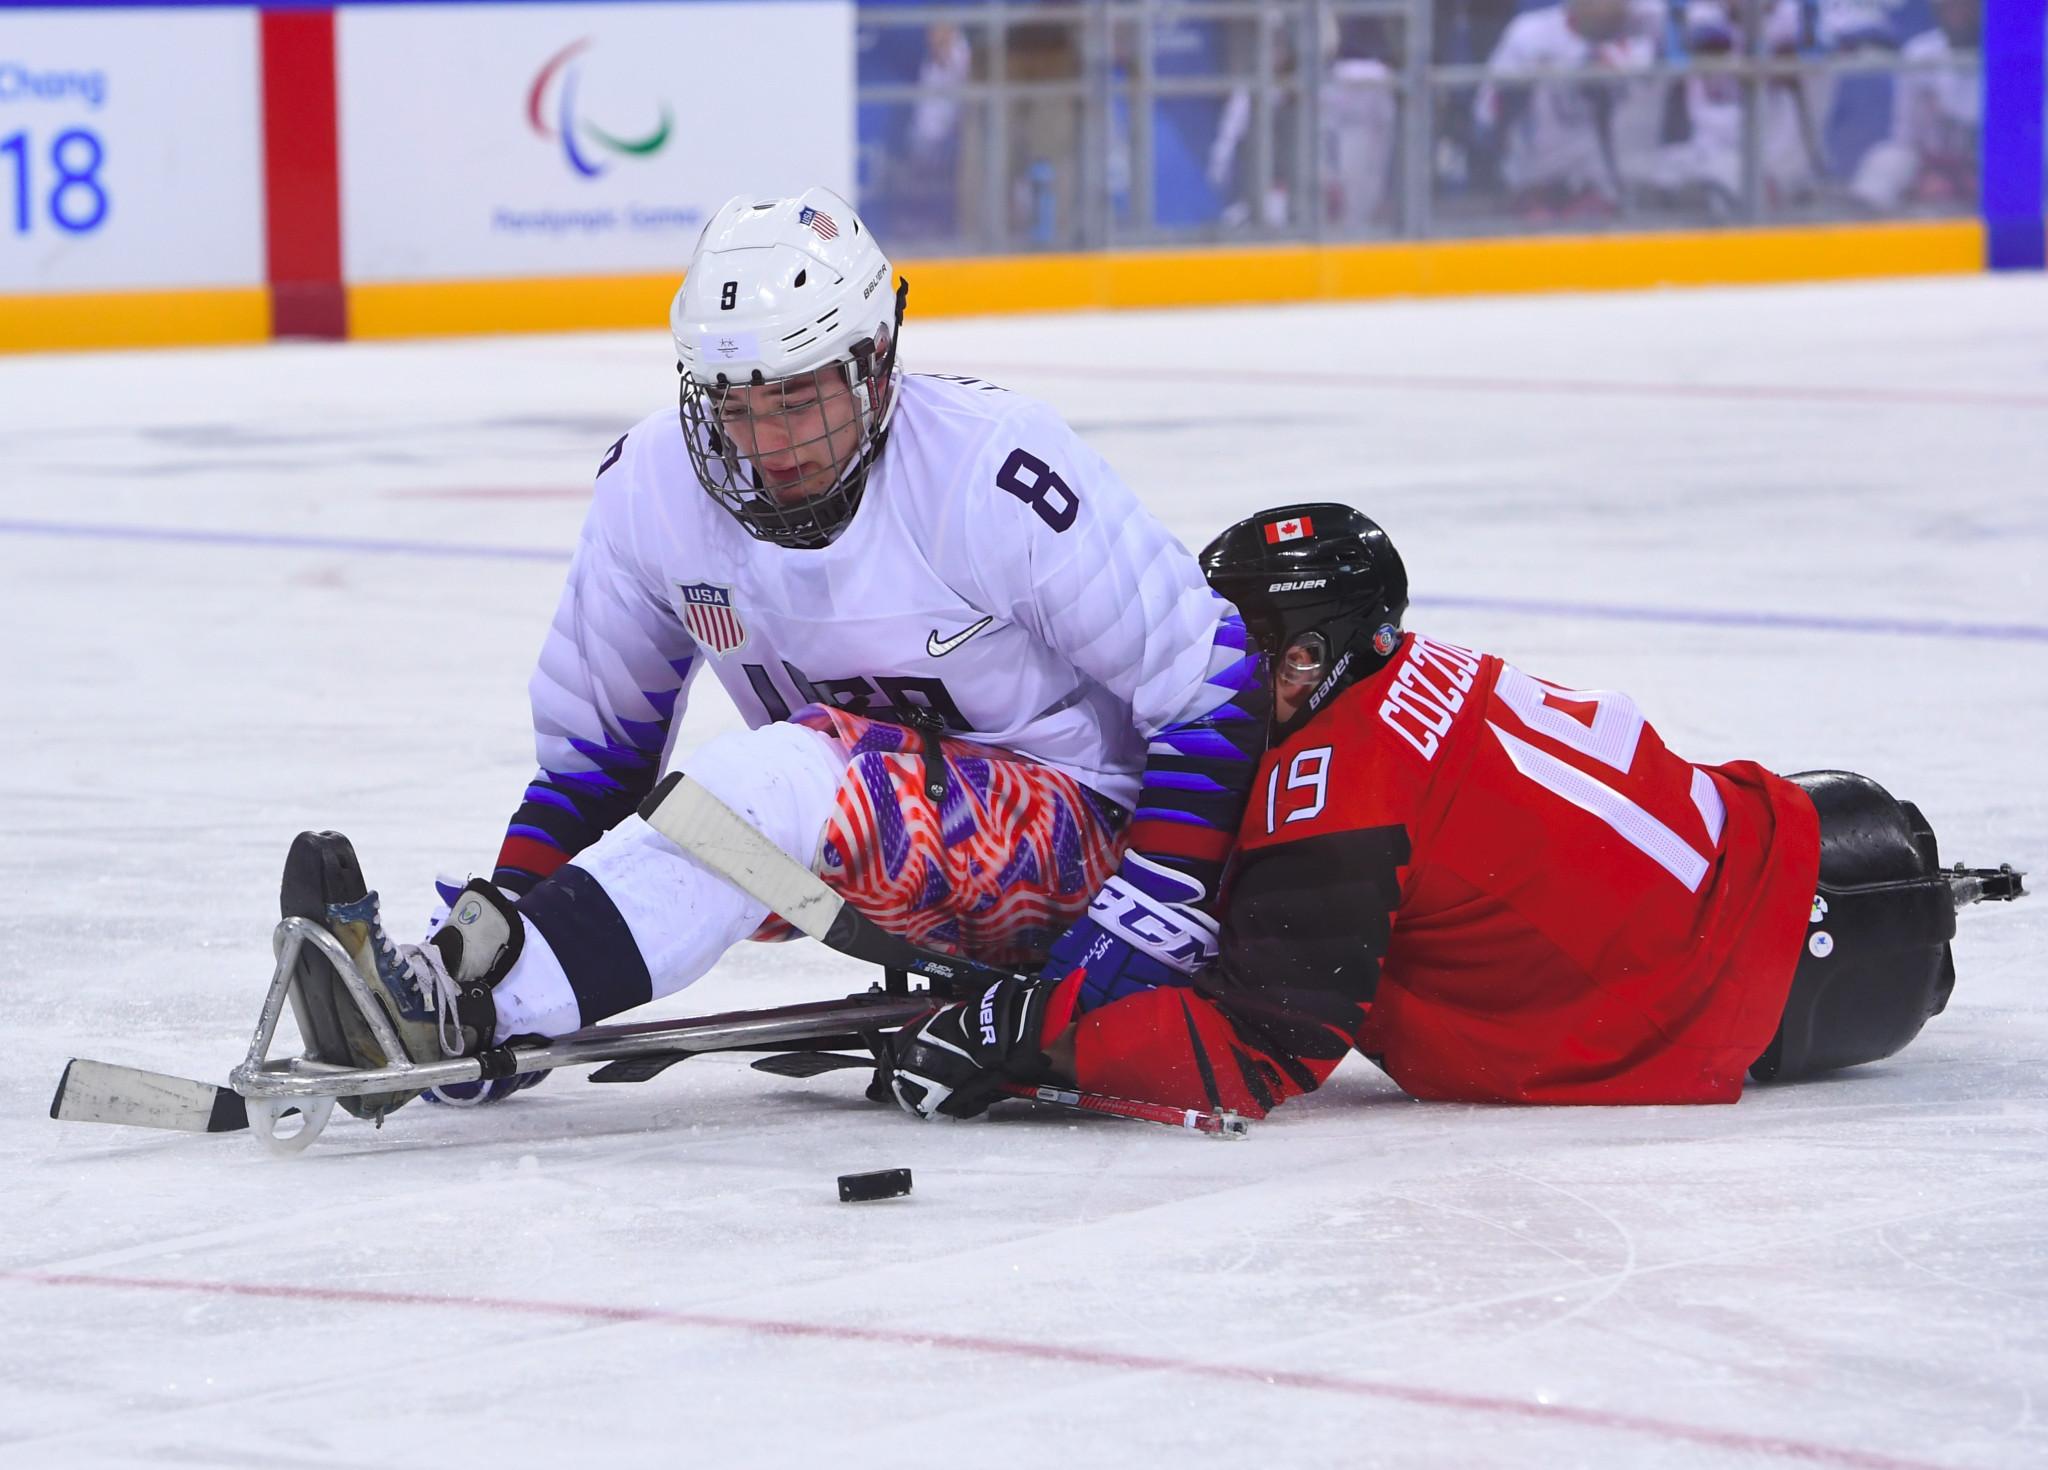 Paralympic sled hockey champion Wallace sets sights on Tokyo 2020 Para-canoe place